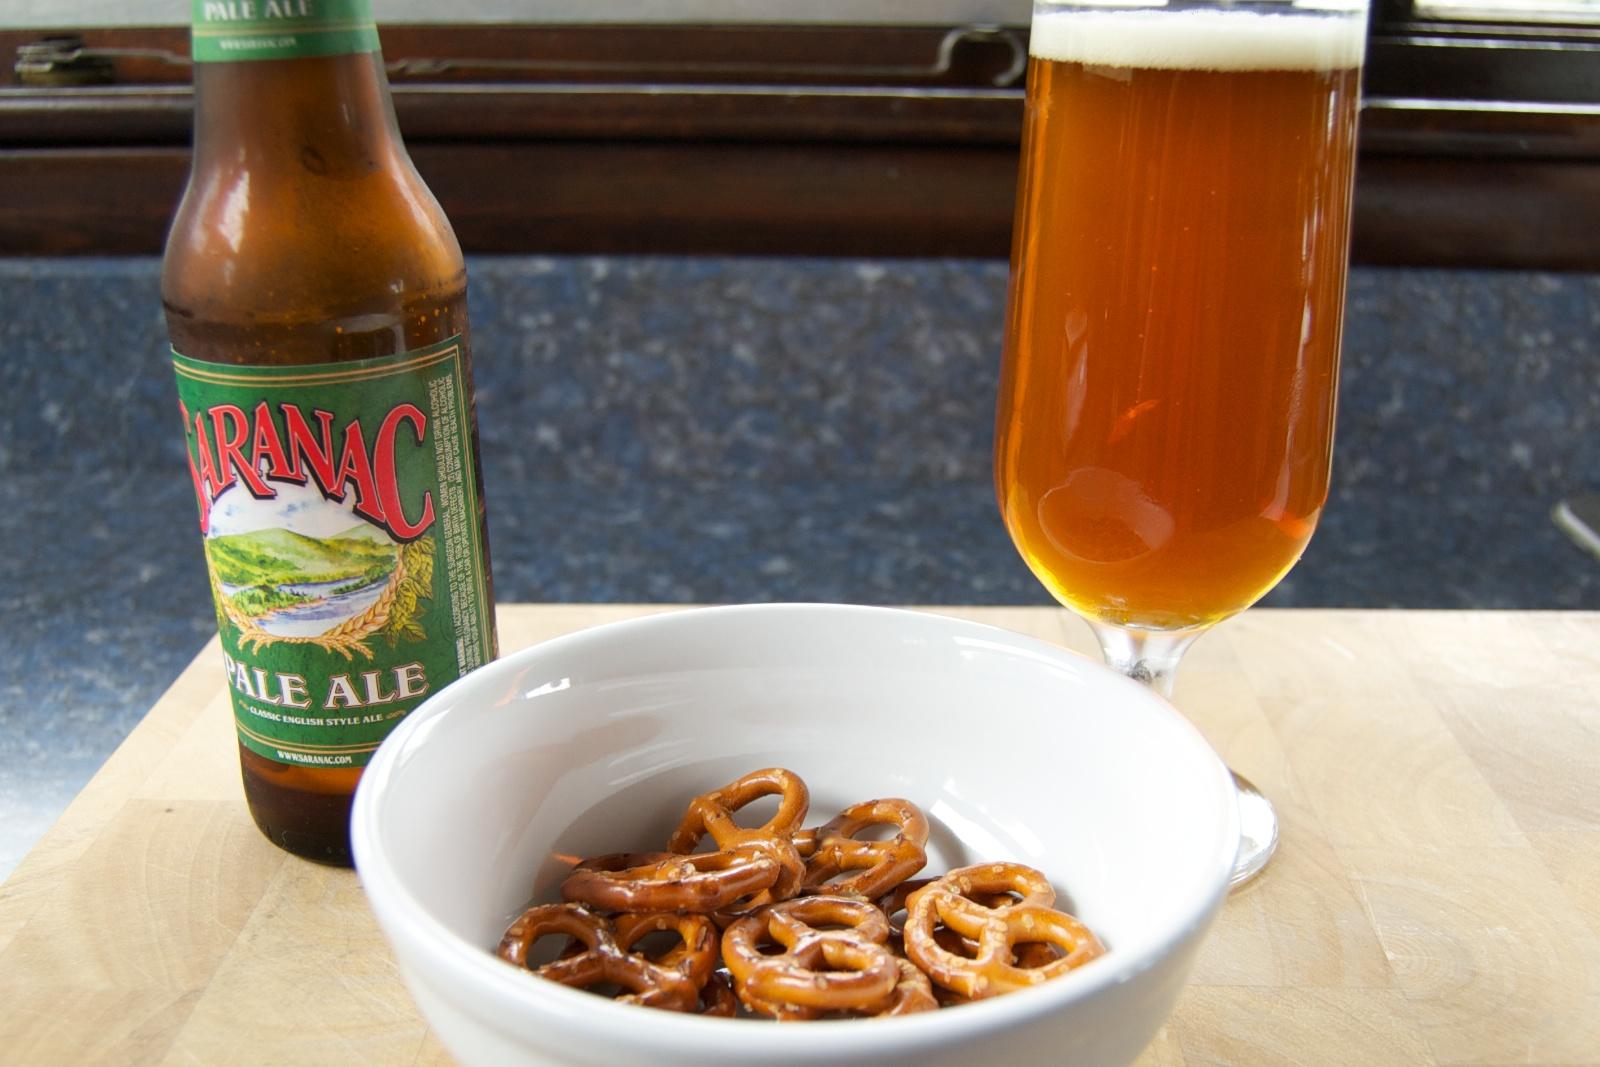 http://blog.rickk.com/food/2012/08/14/ate.2012.08.14.s1.jpg